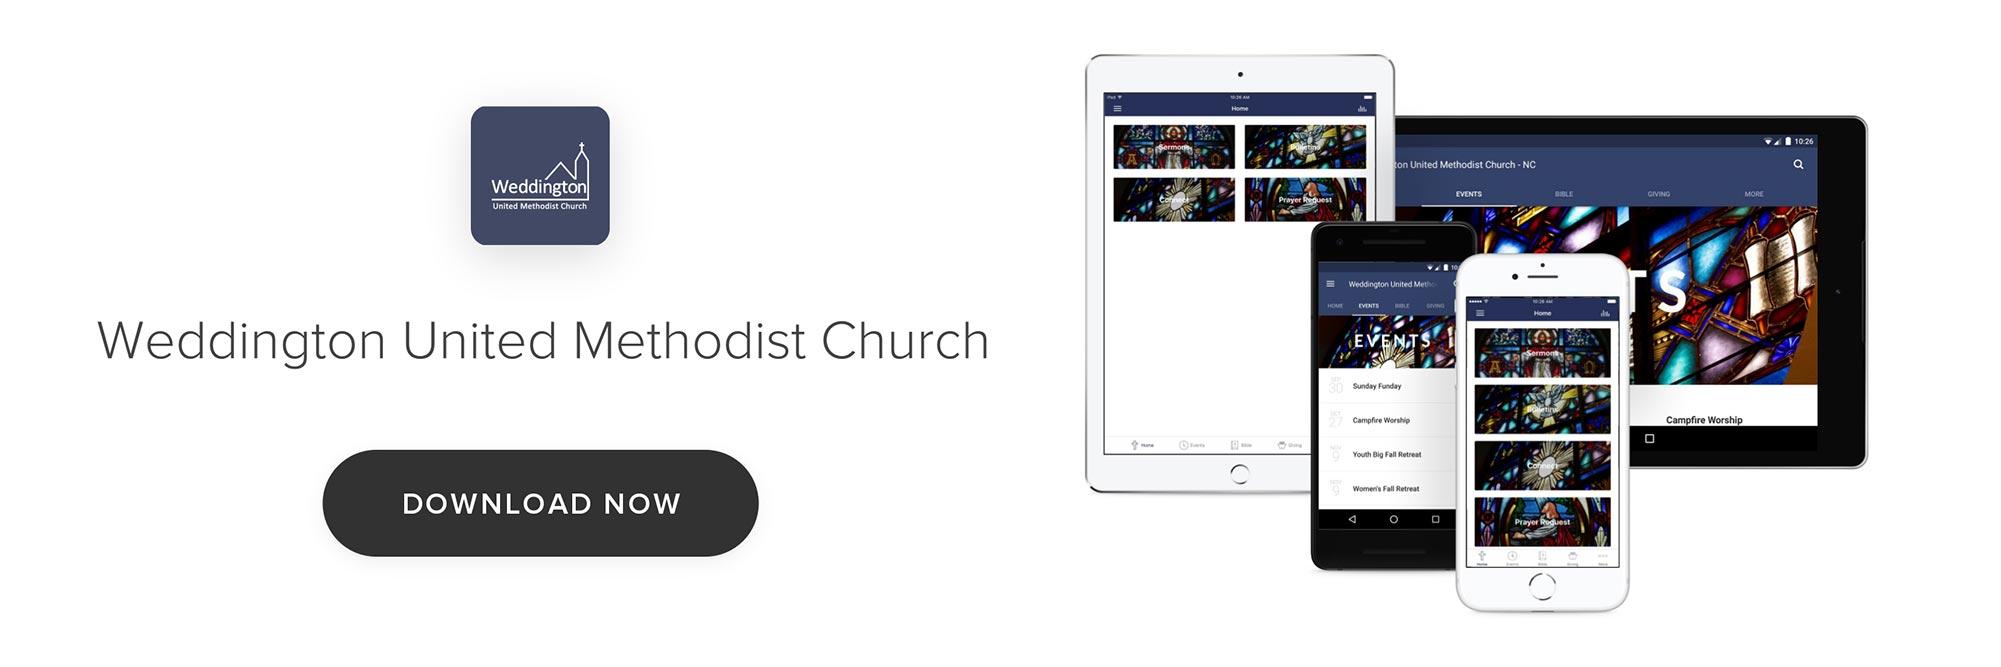 Weddington Church App Screenshots